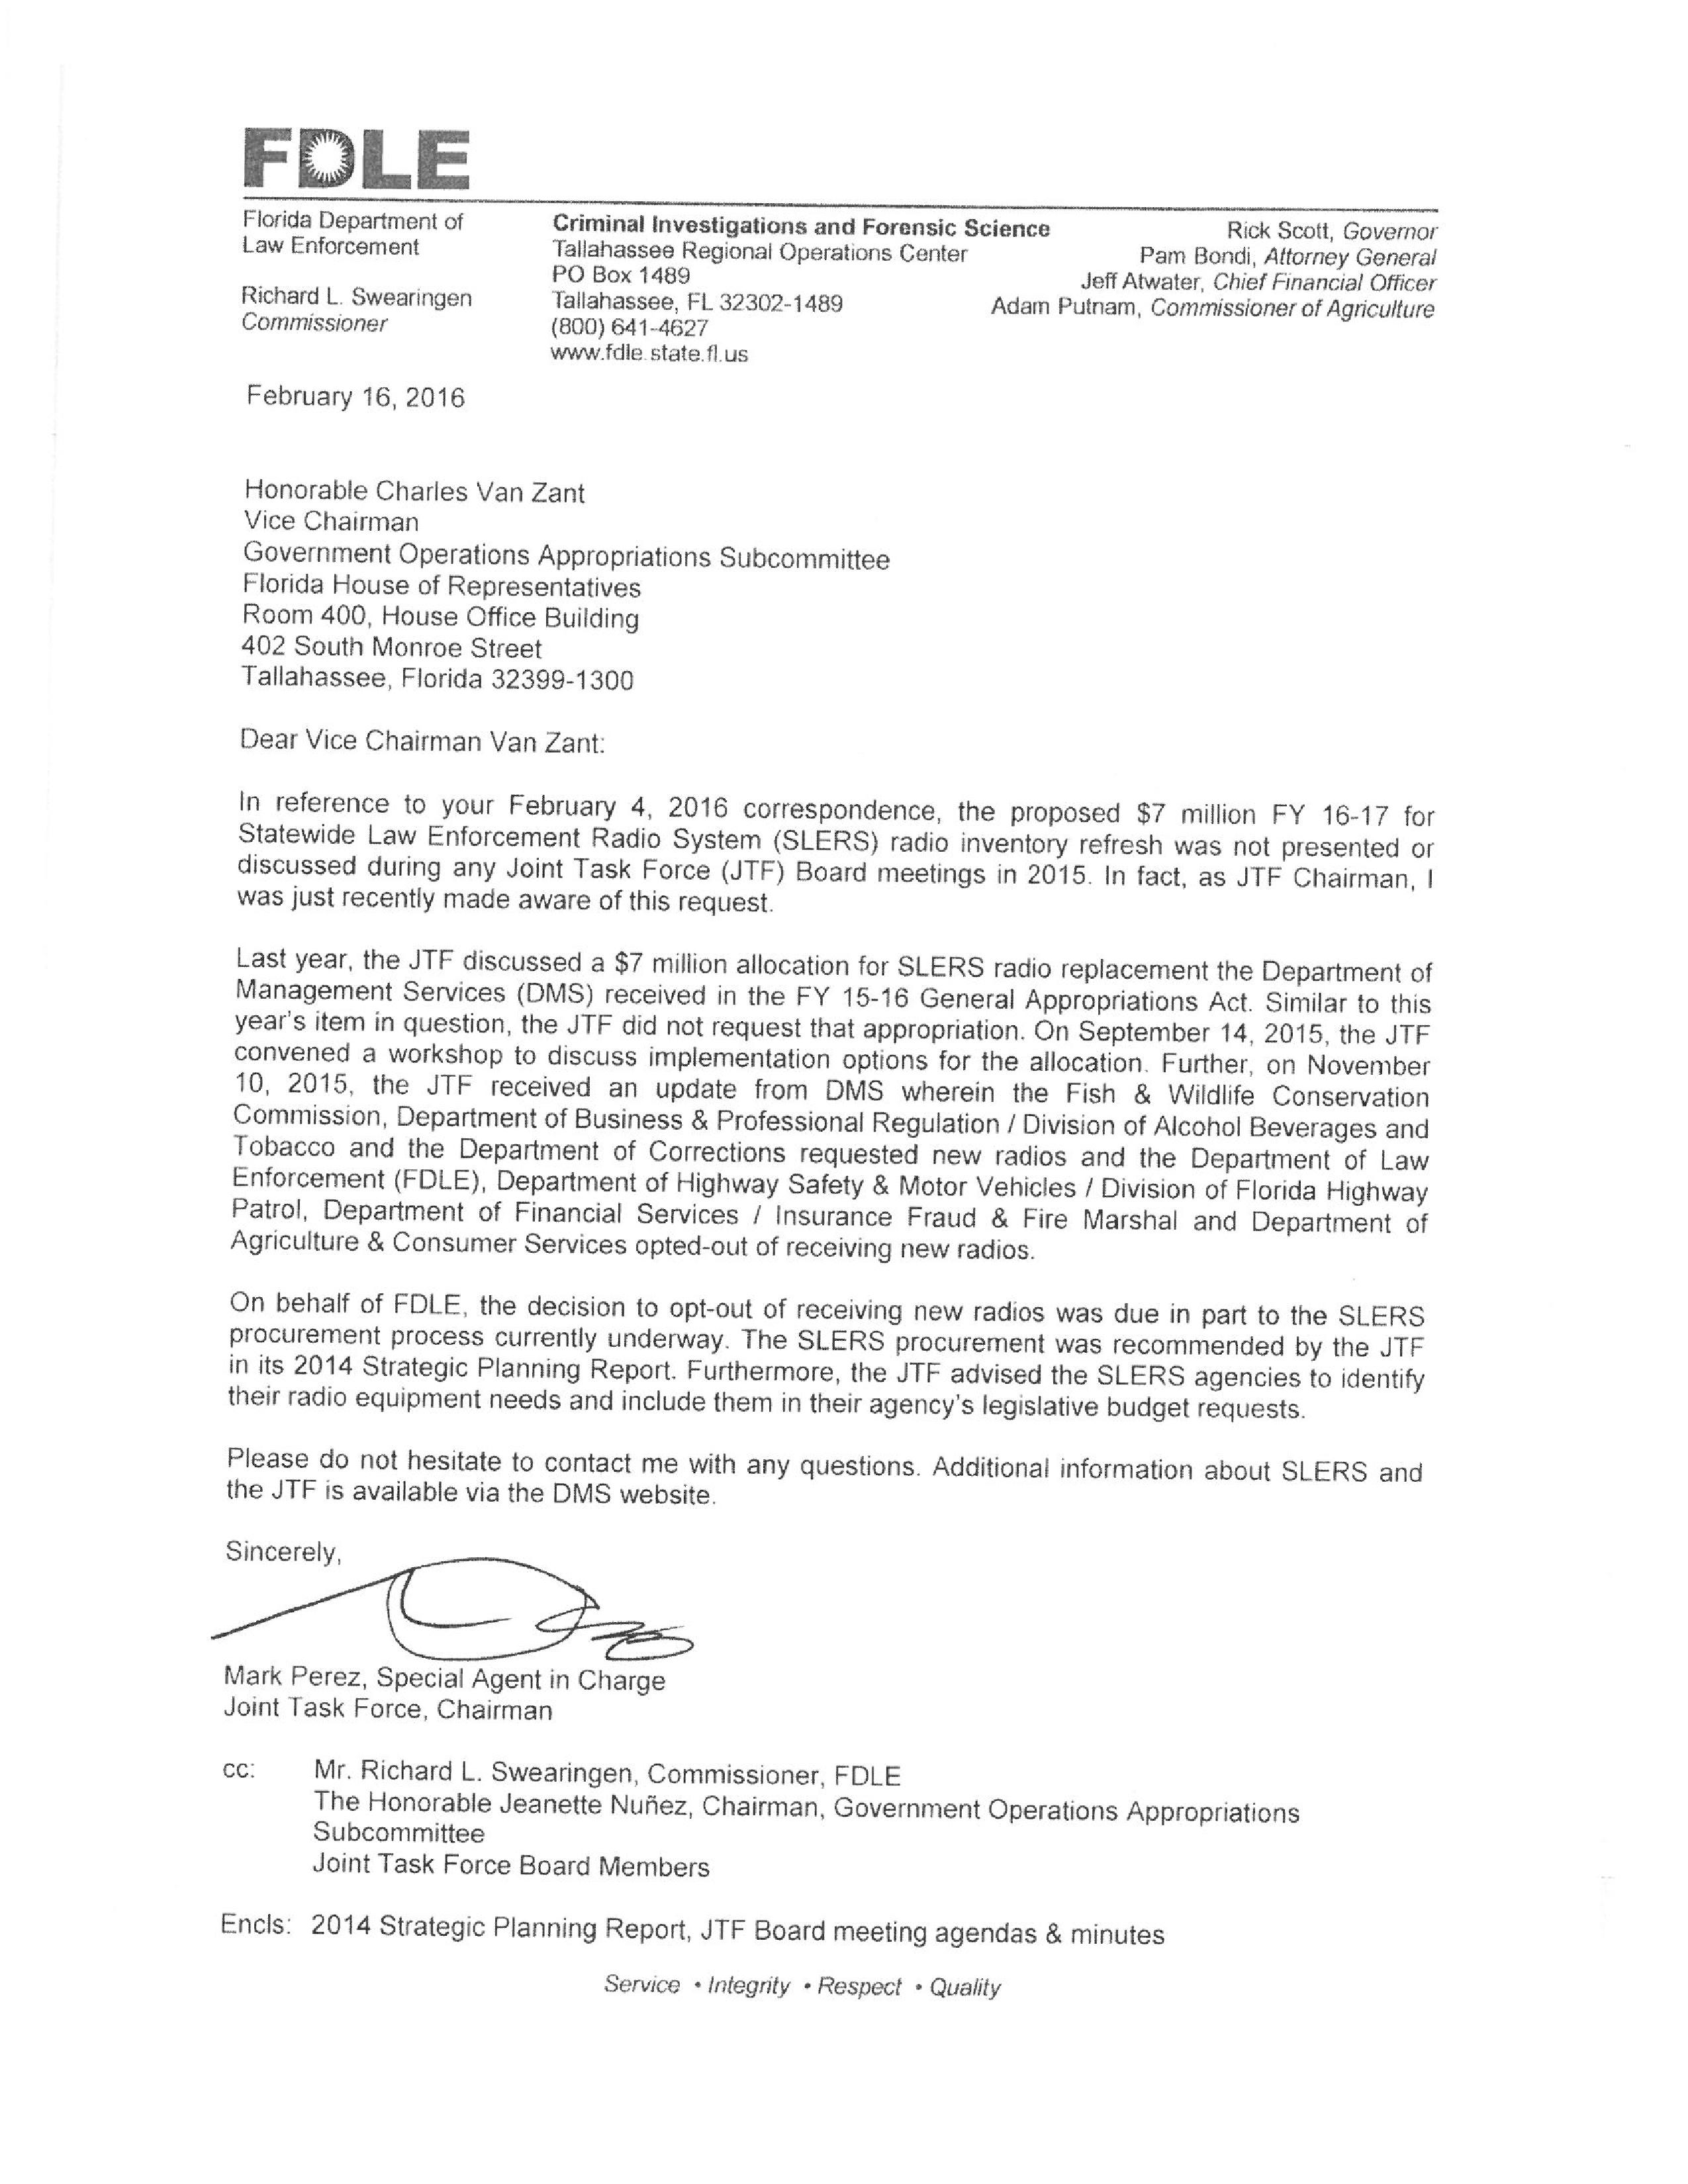 VZ Letter-Response-page-002